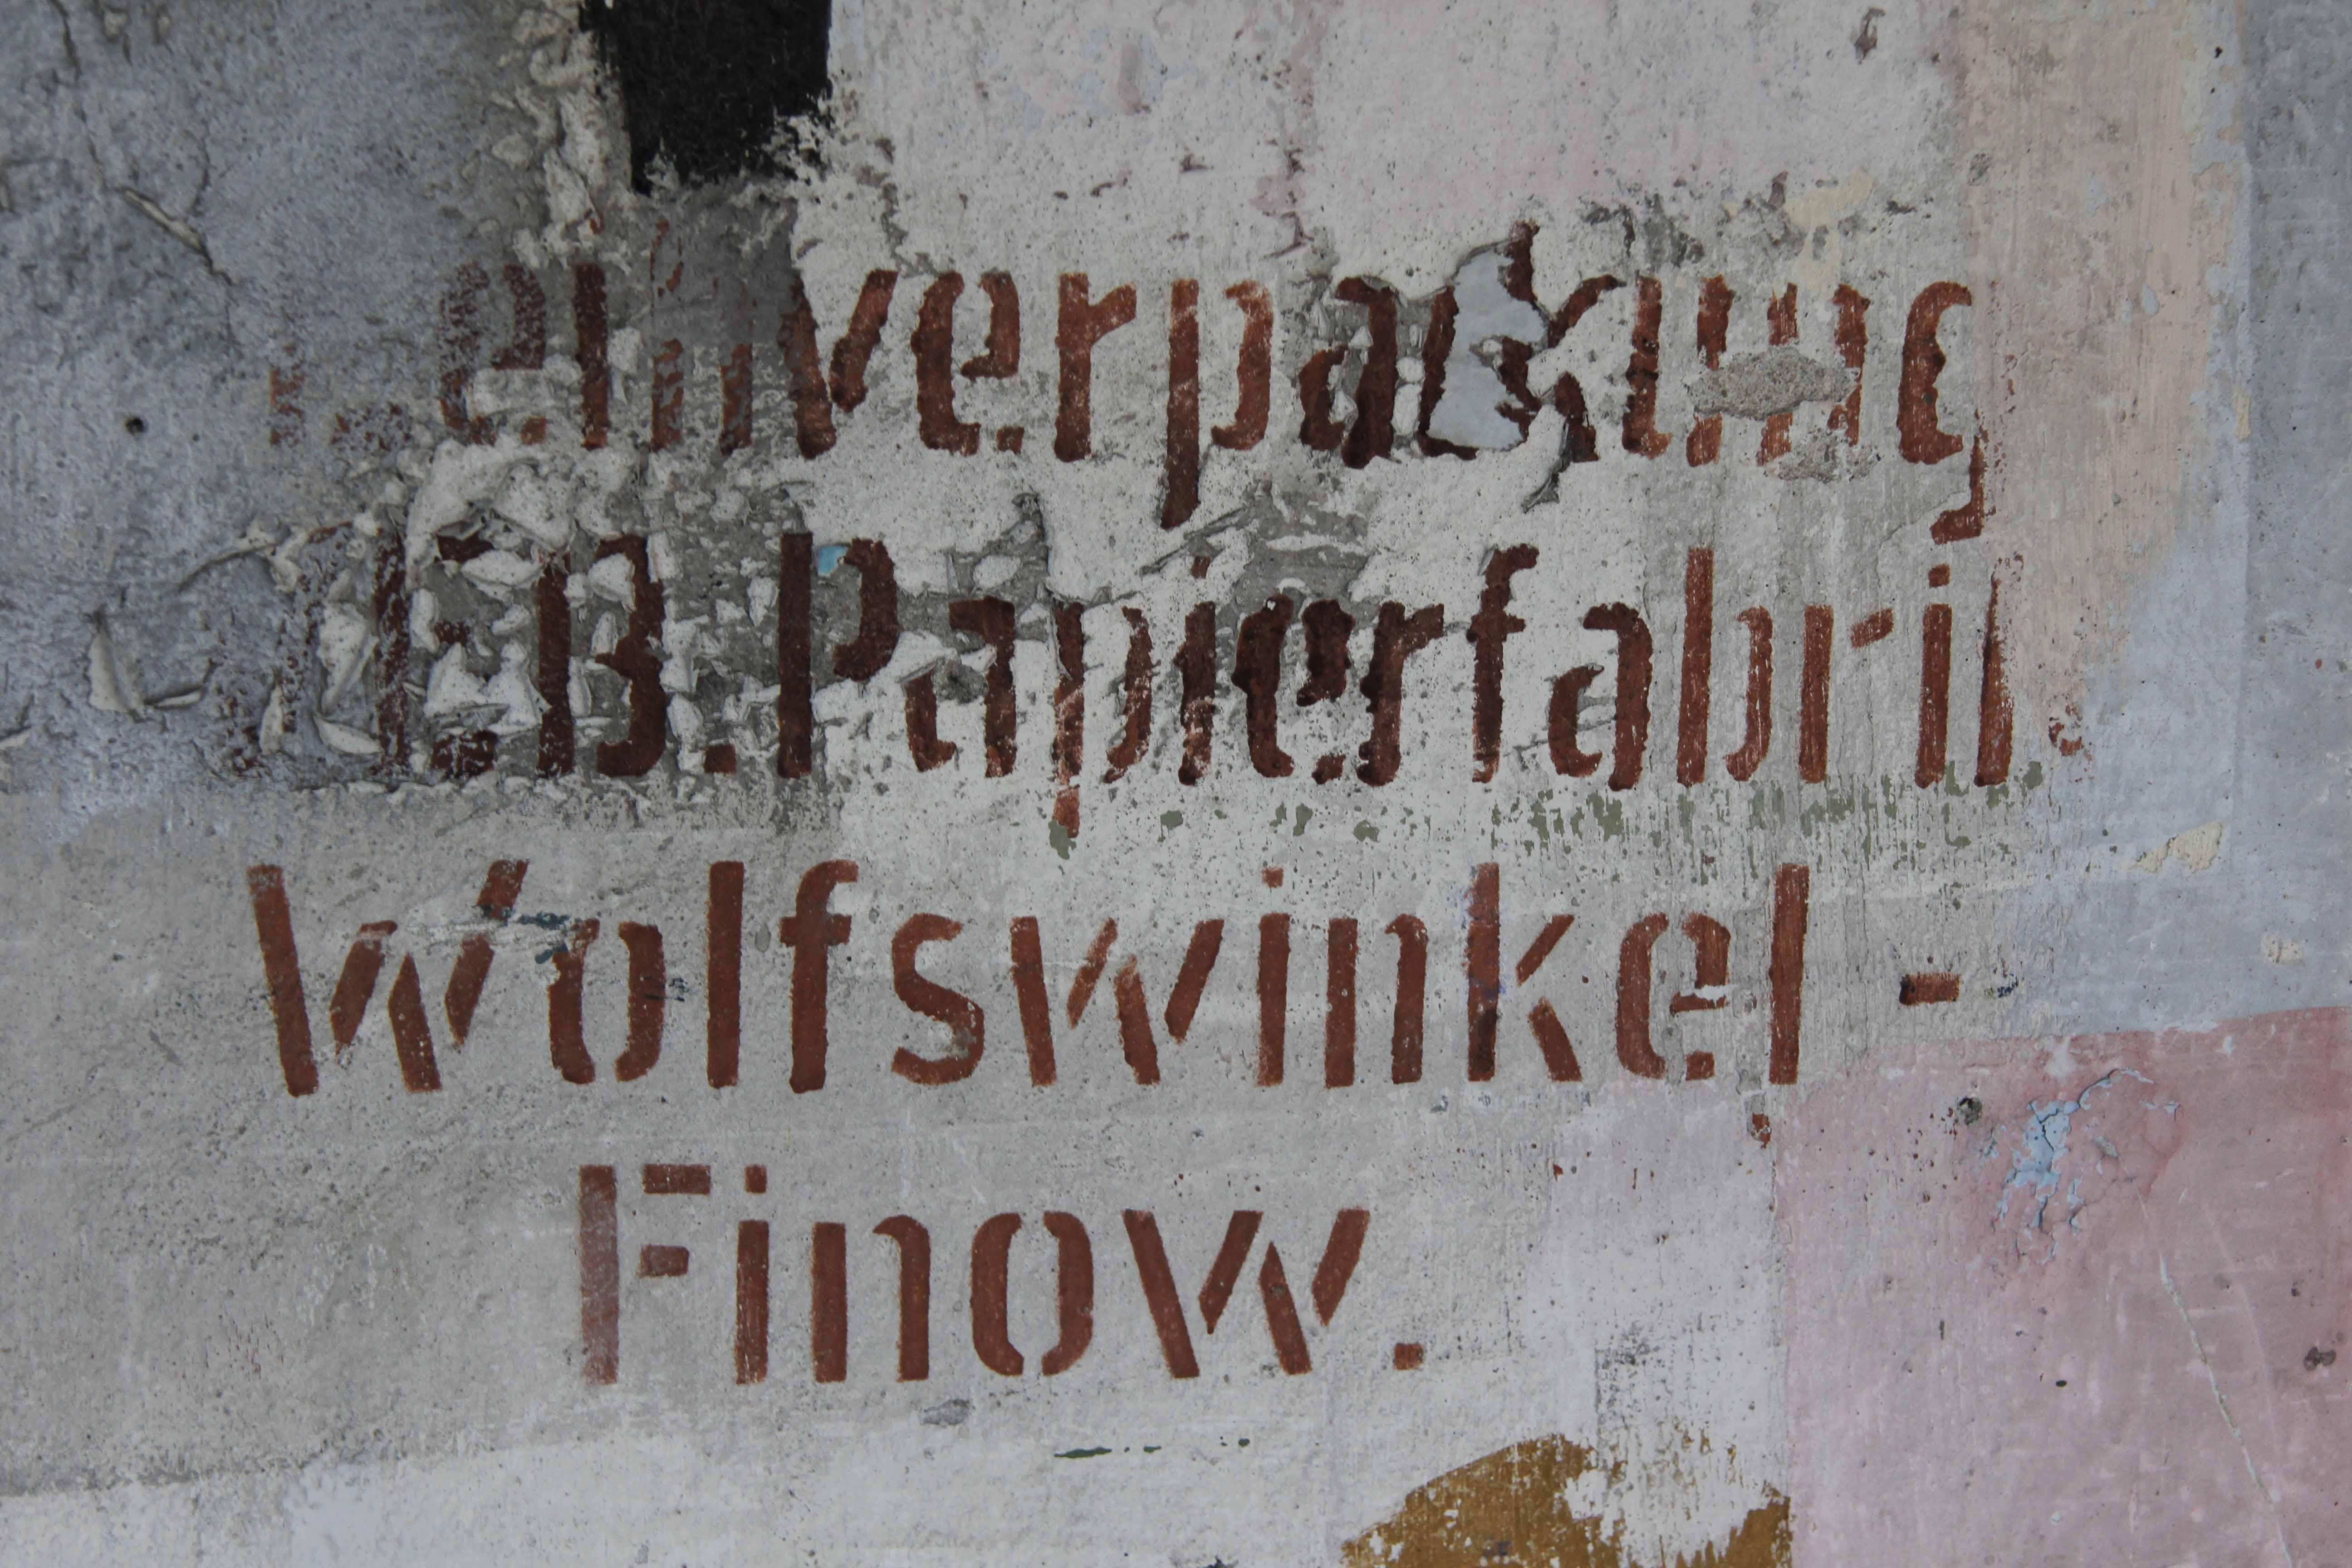 Writing On The Wall at Papierfabrik Wolfswinkel, an abandoned paper mill near Berlin